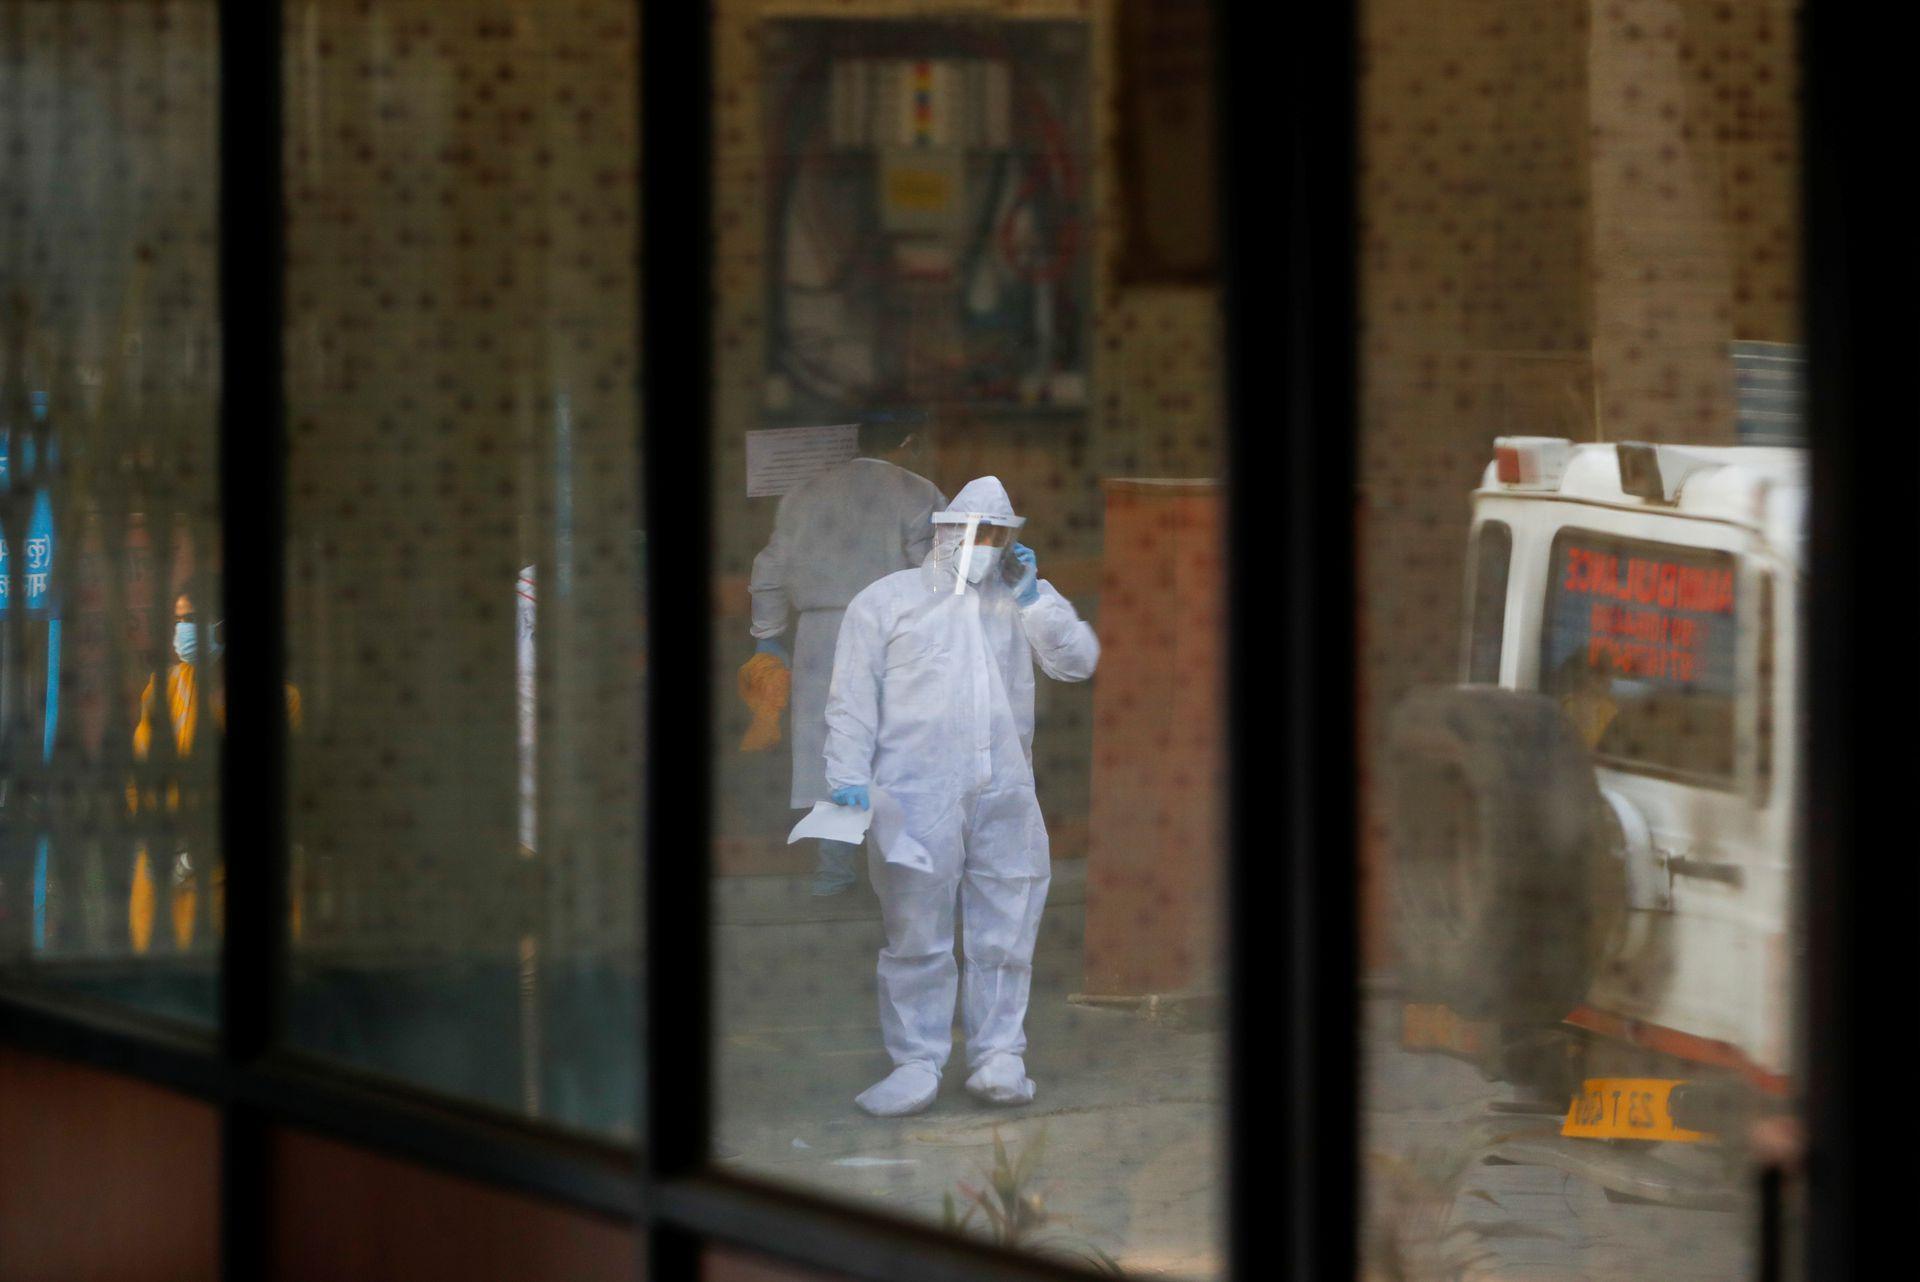 India coronavirus cases set new global record, U.S. readies help